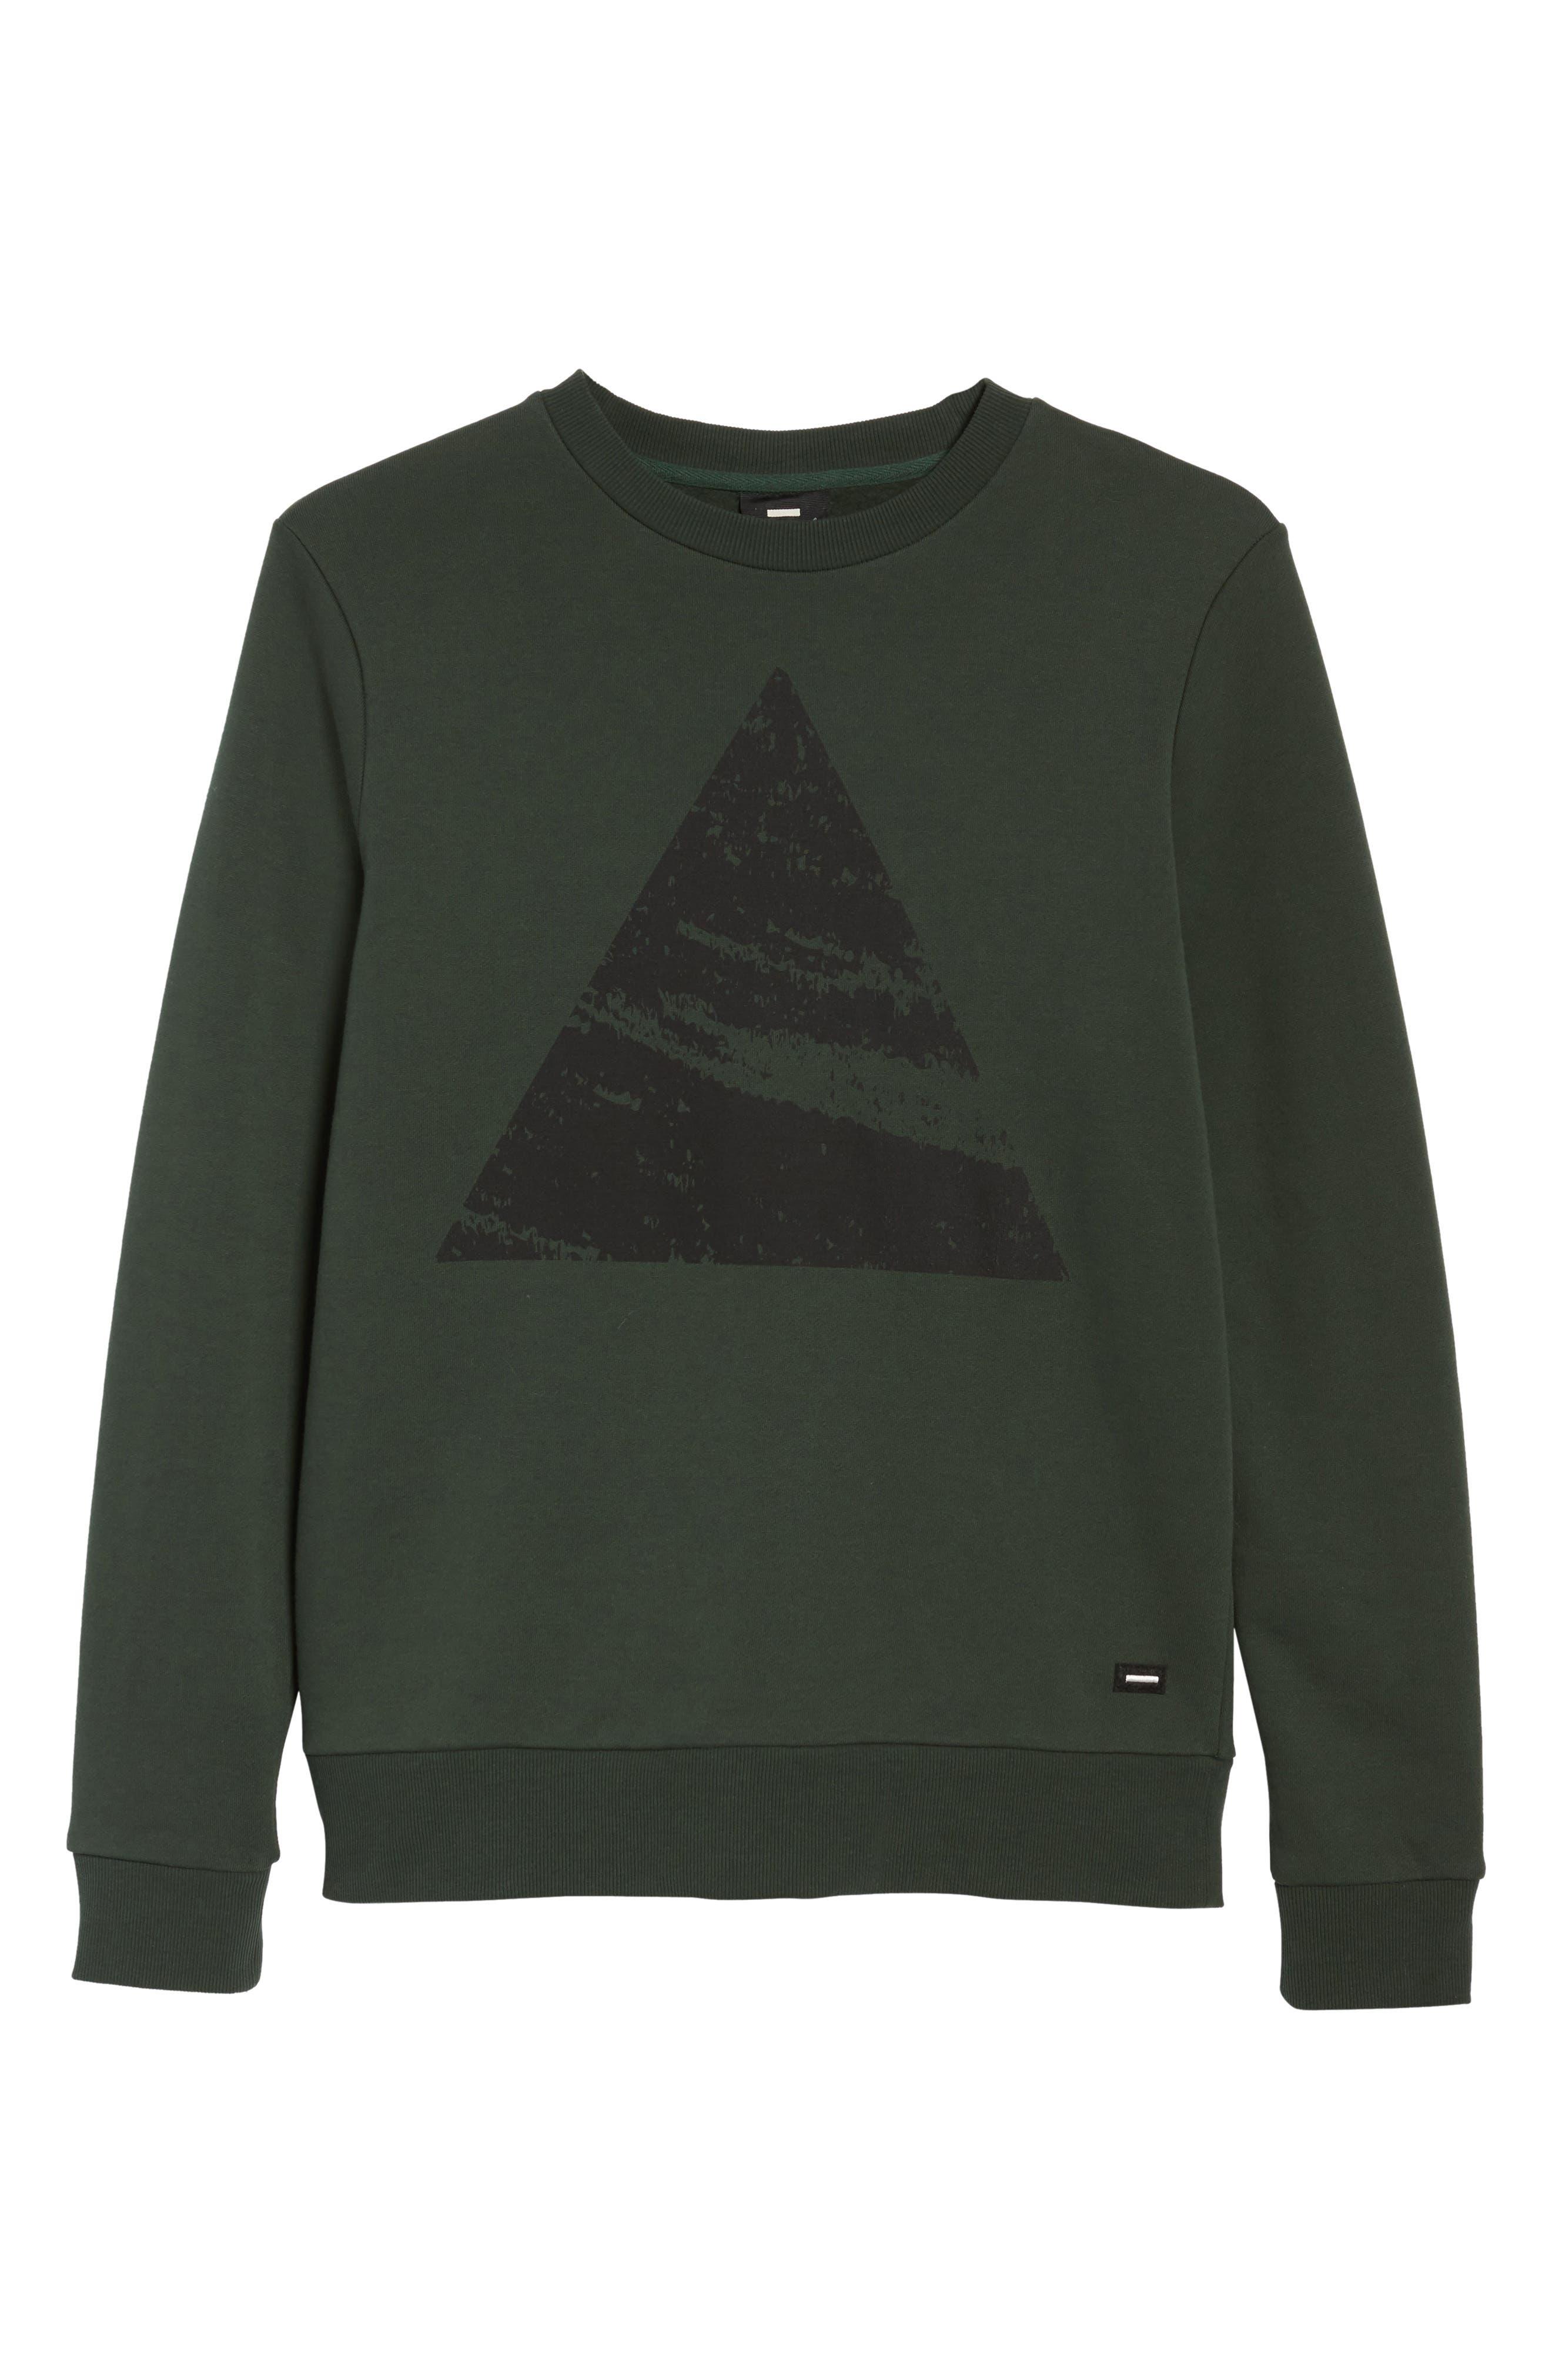 Adrian Sweatshirt,                             Alternate thumbnail 6, color,                             Green Mountain Peak